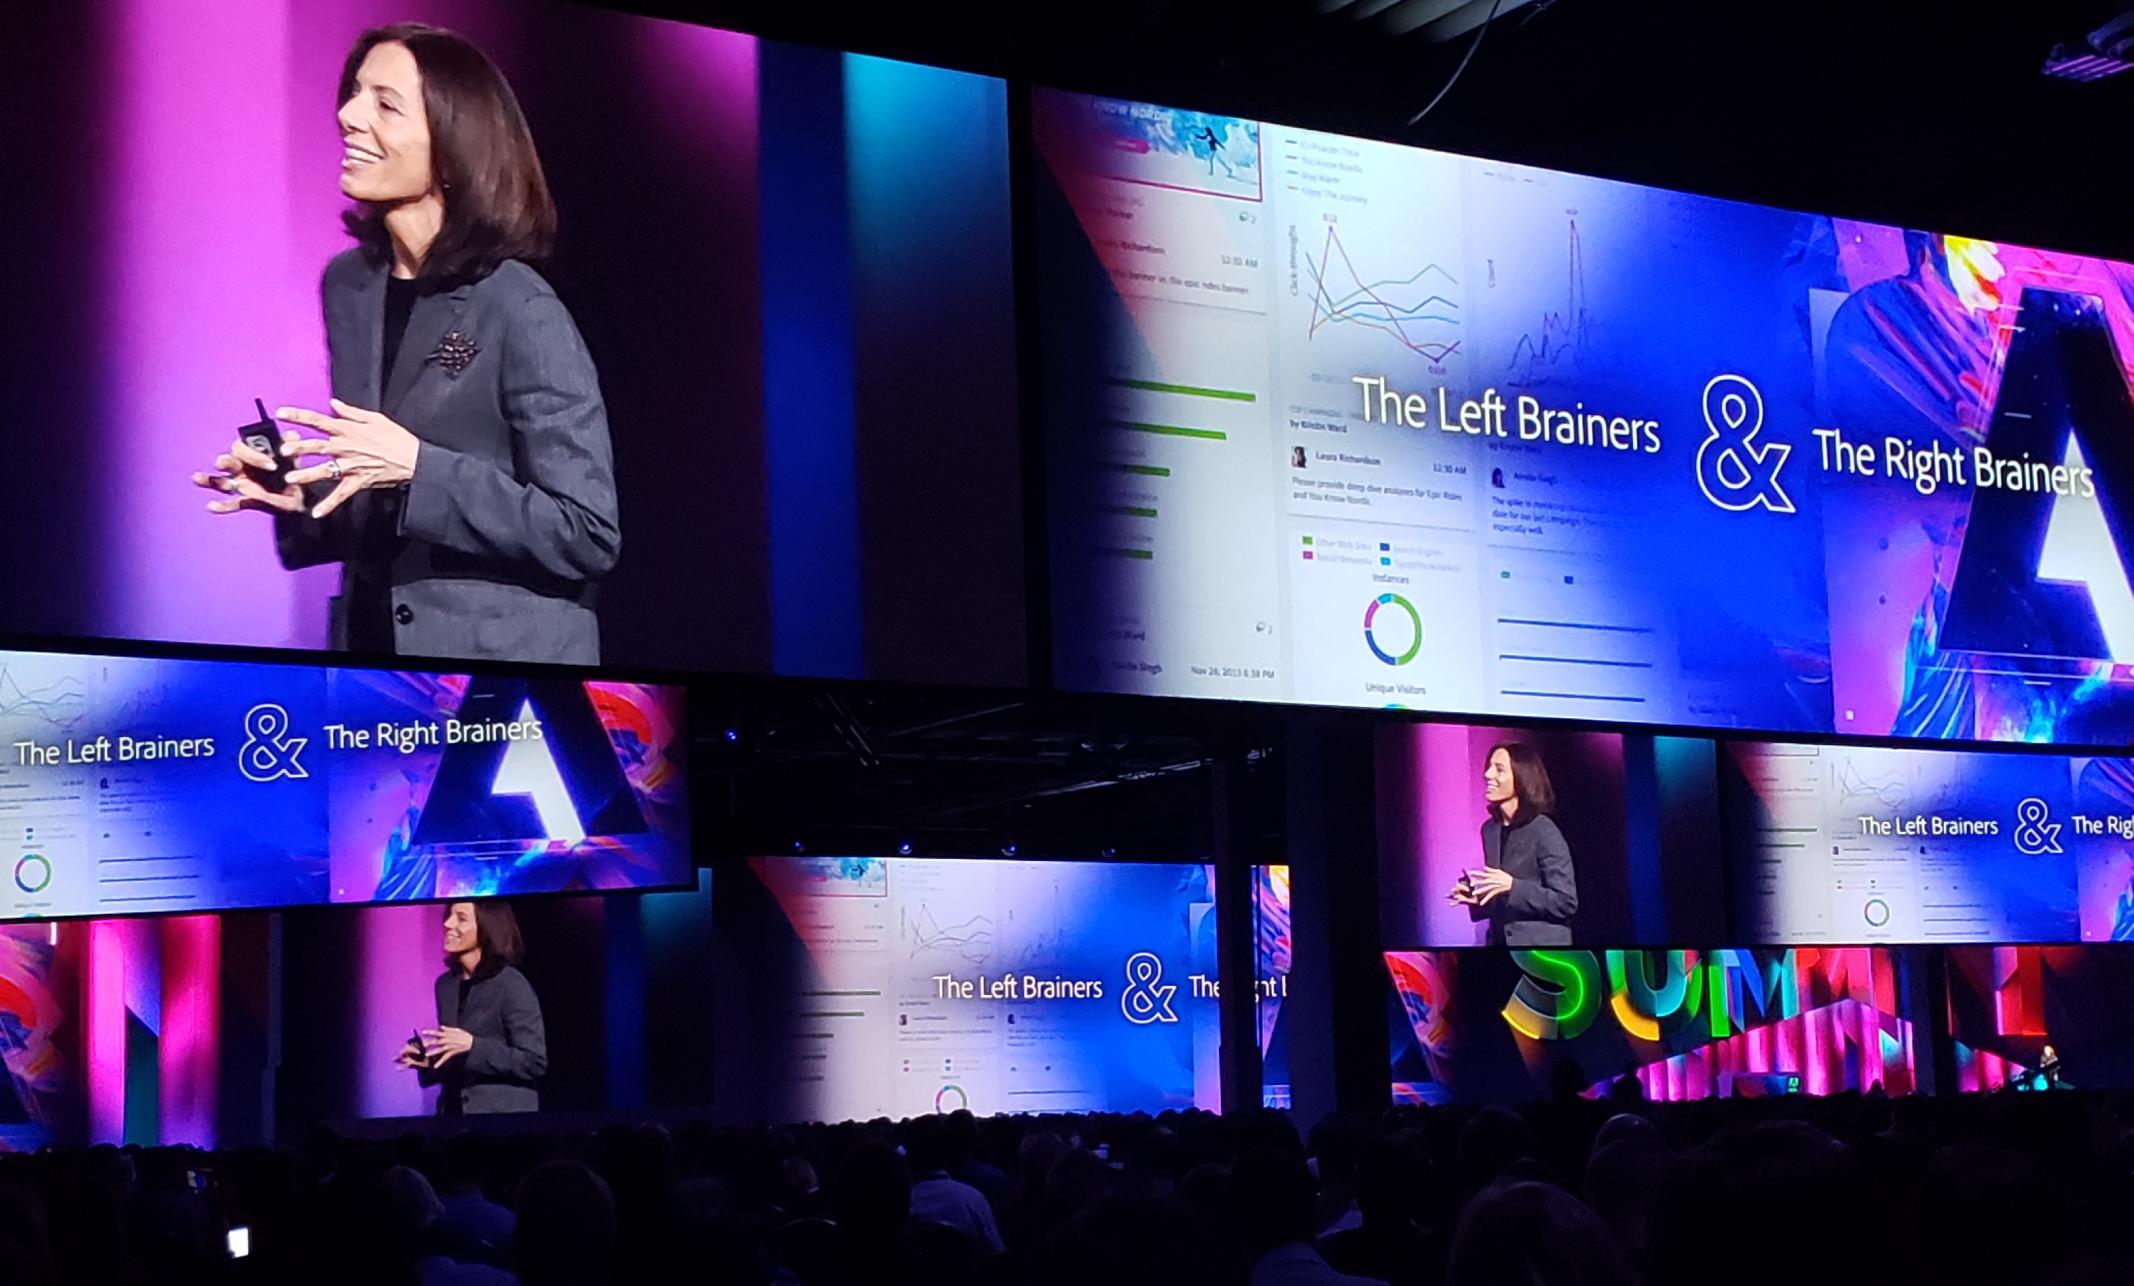 Adobe Summit 2019 keynote speaker stage